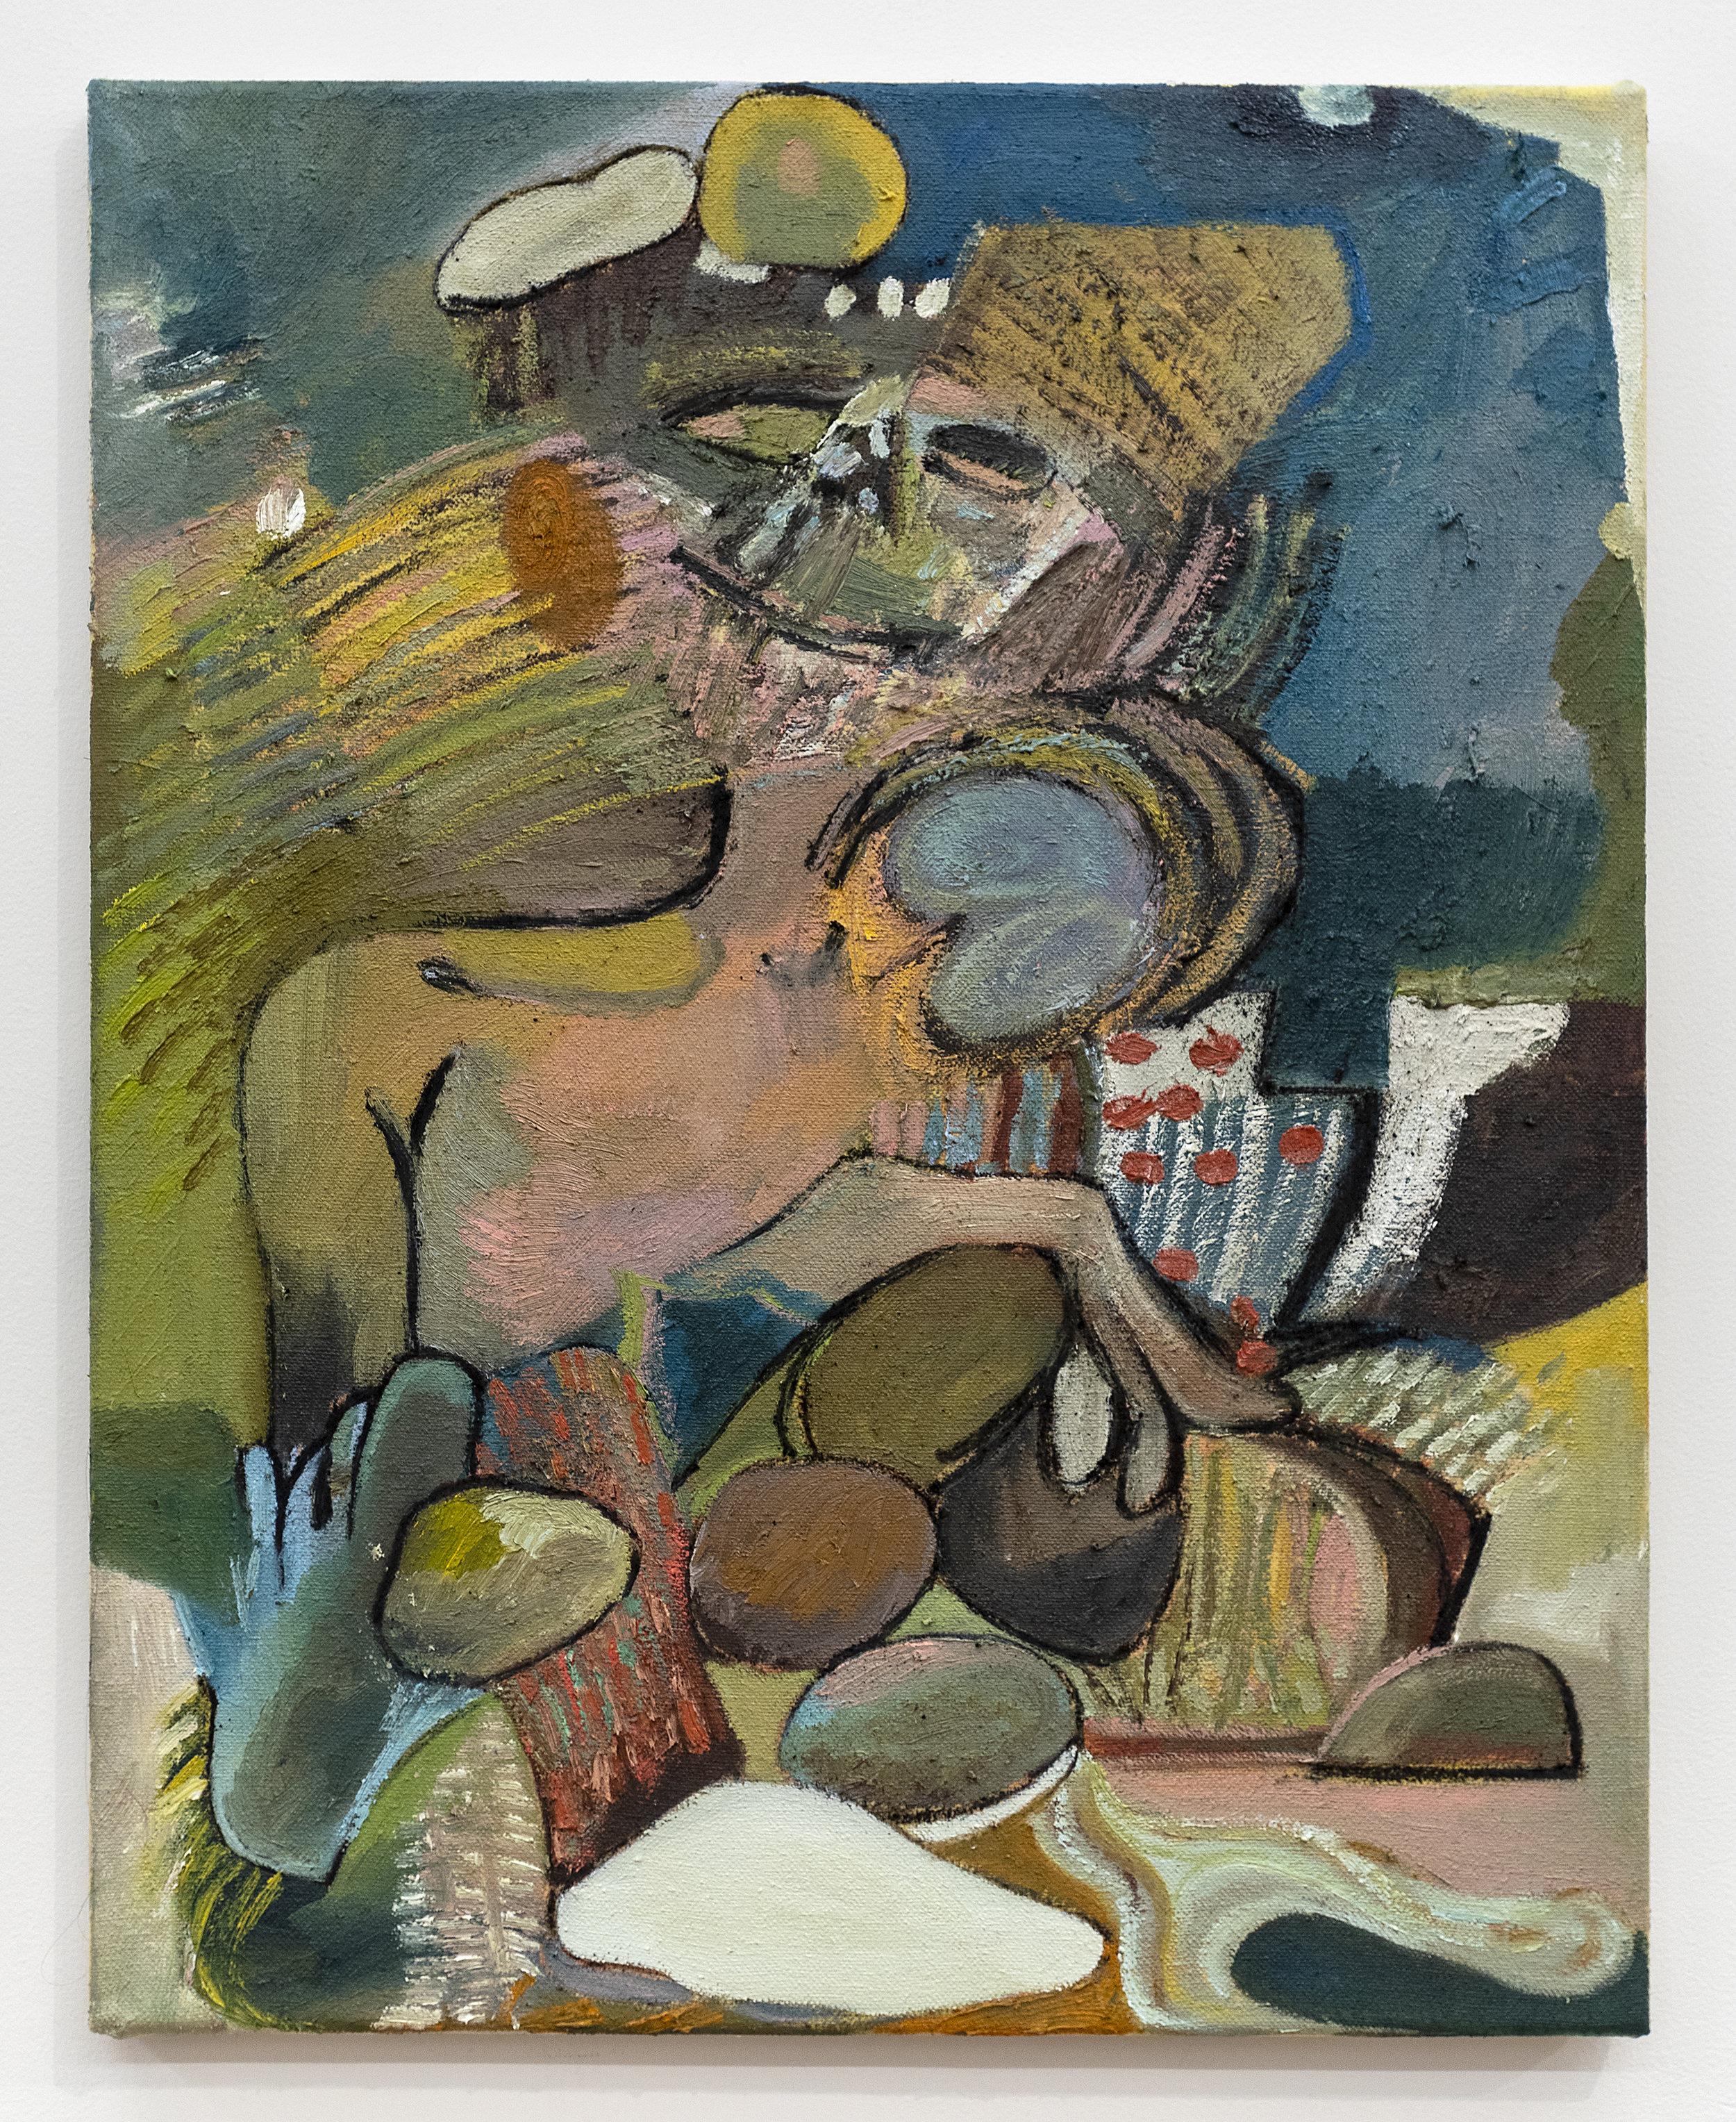 Matias Argañaraz  Rancio!  2019 Oil and ink on canvas 20 x 16 inches